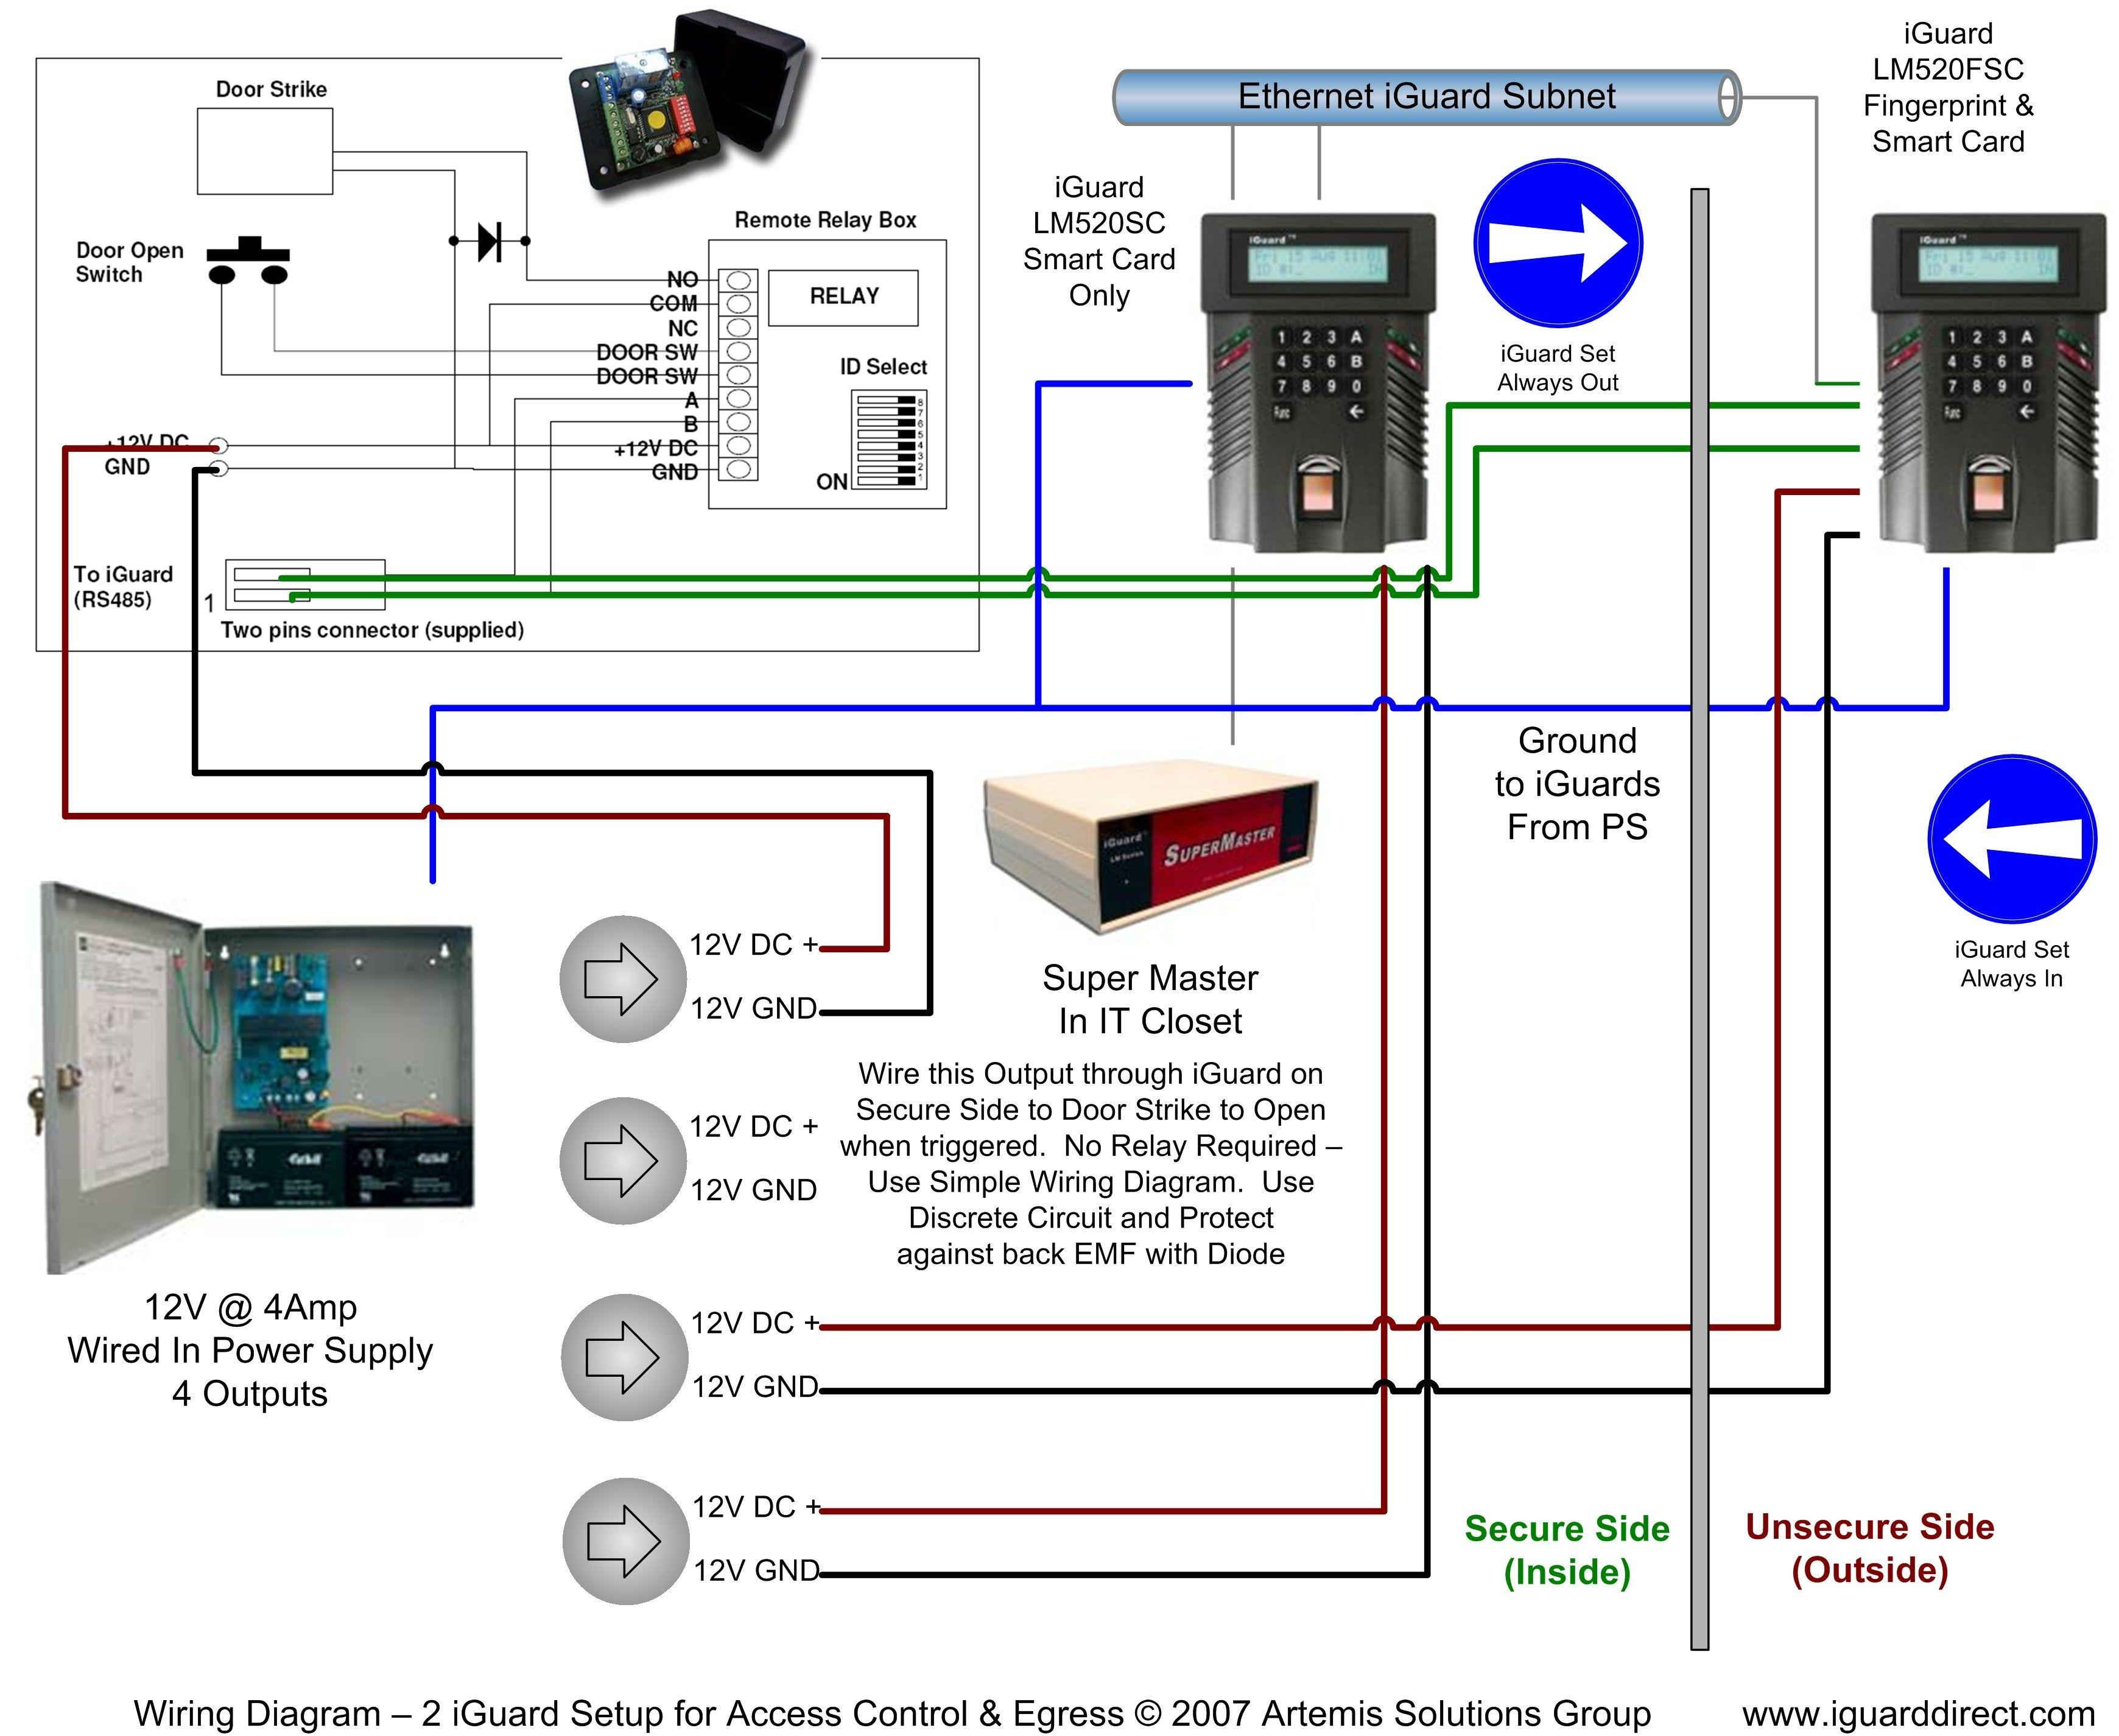 2004 ford f 250 wiring diagram moreover kantech access control door rh autonomia co Access Control List Diagram Door Access Control Symbol